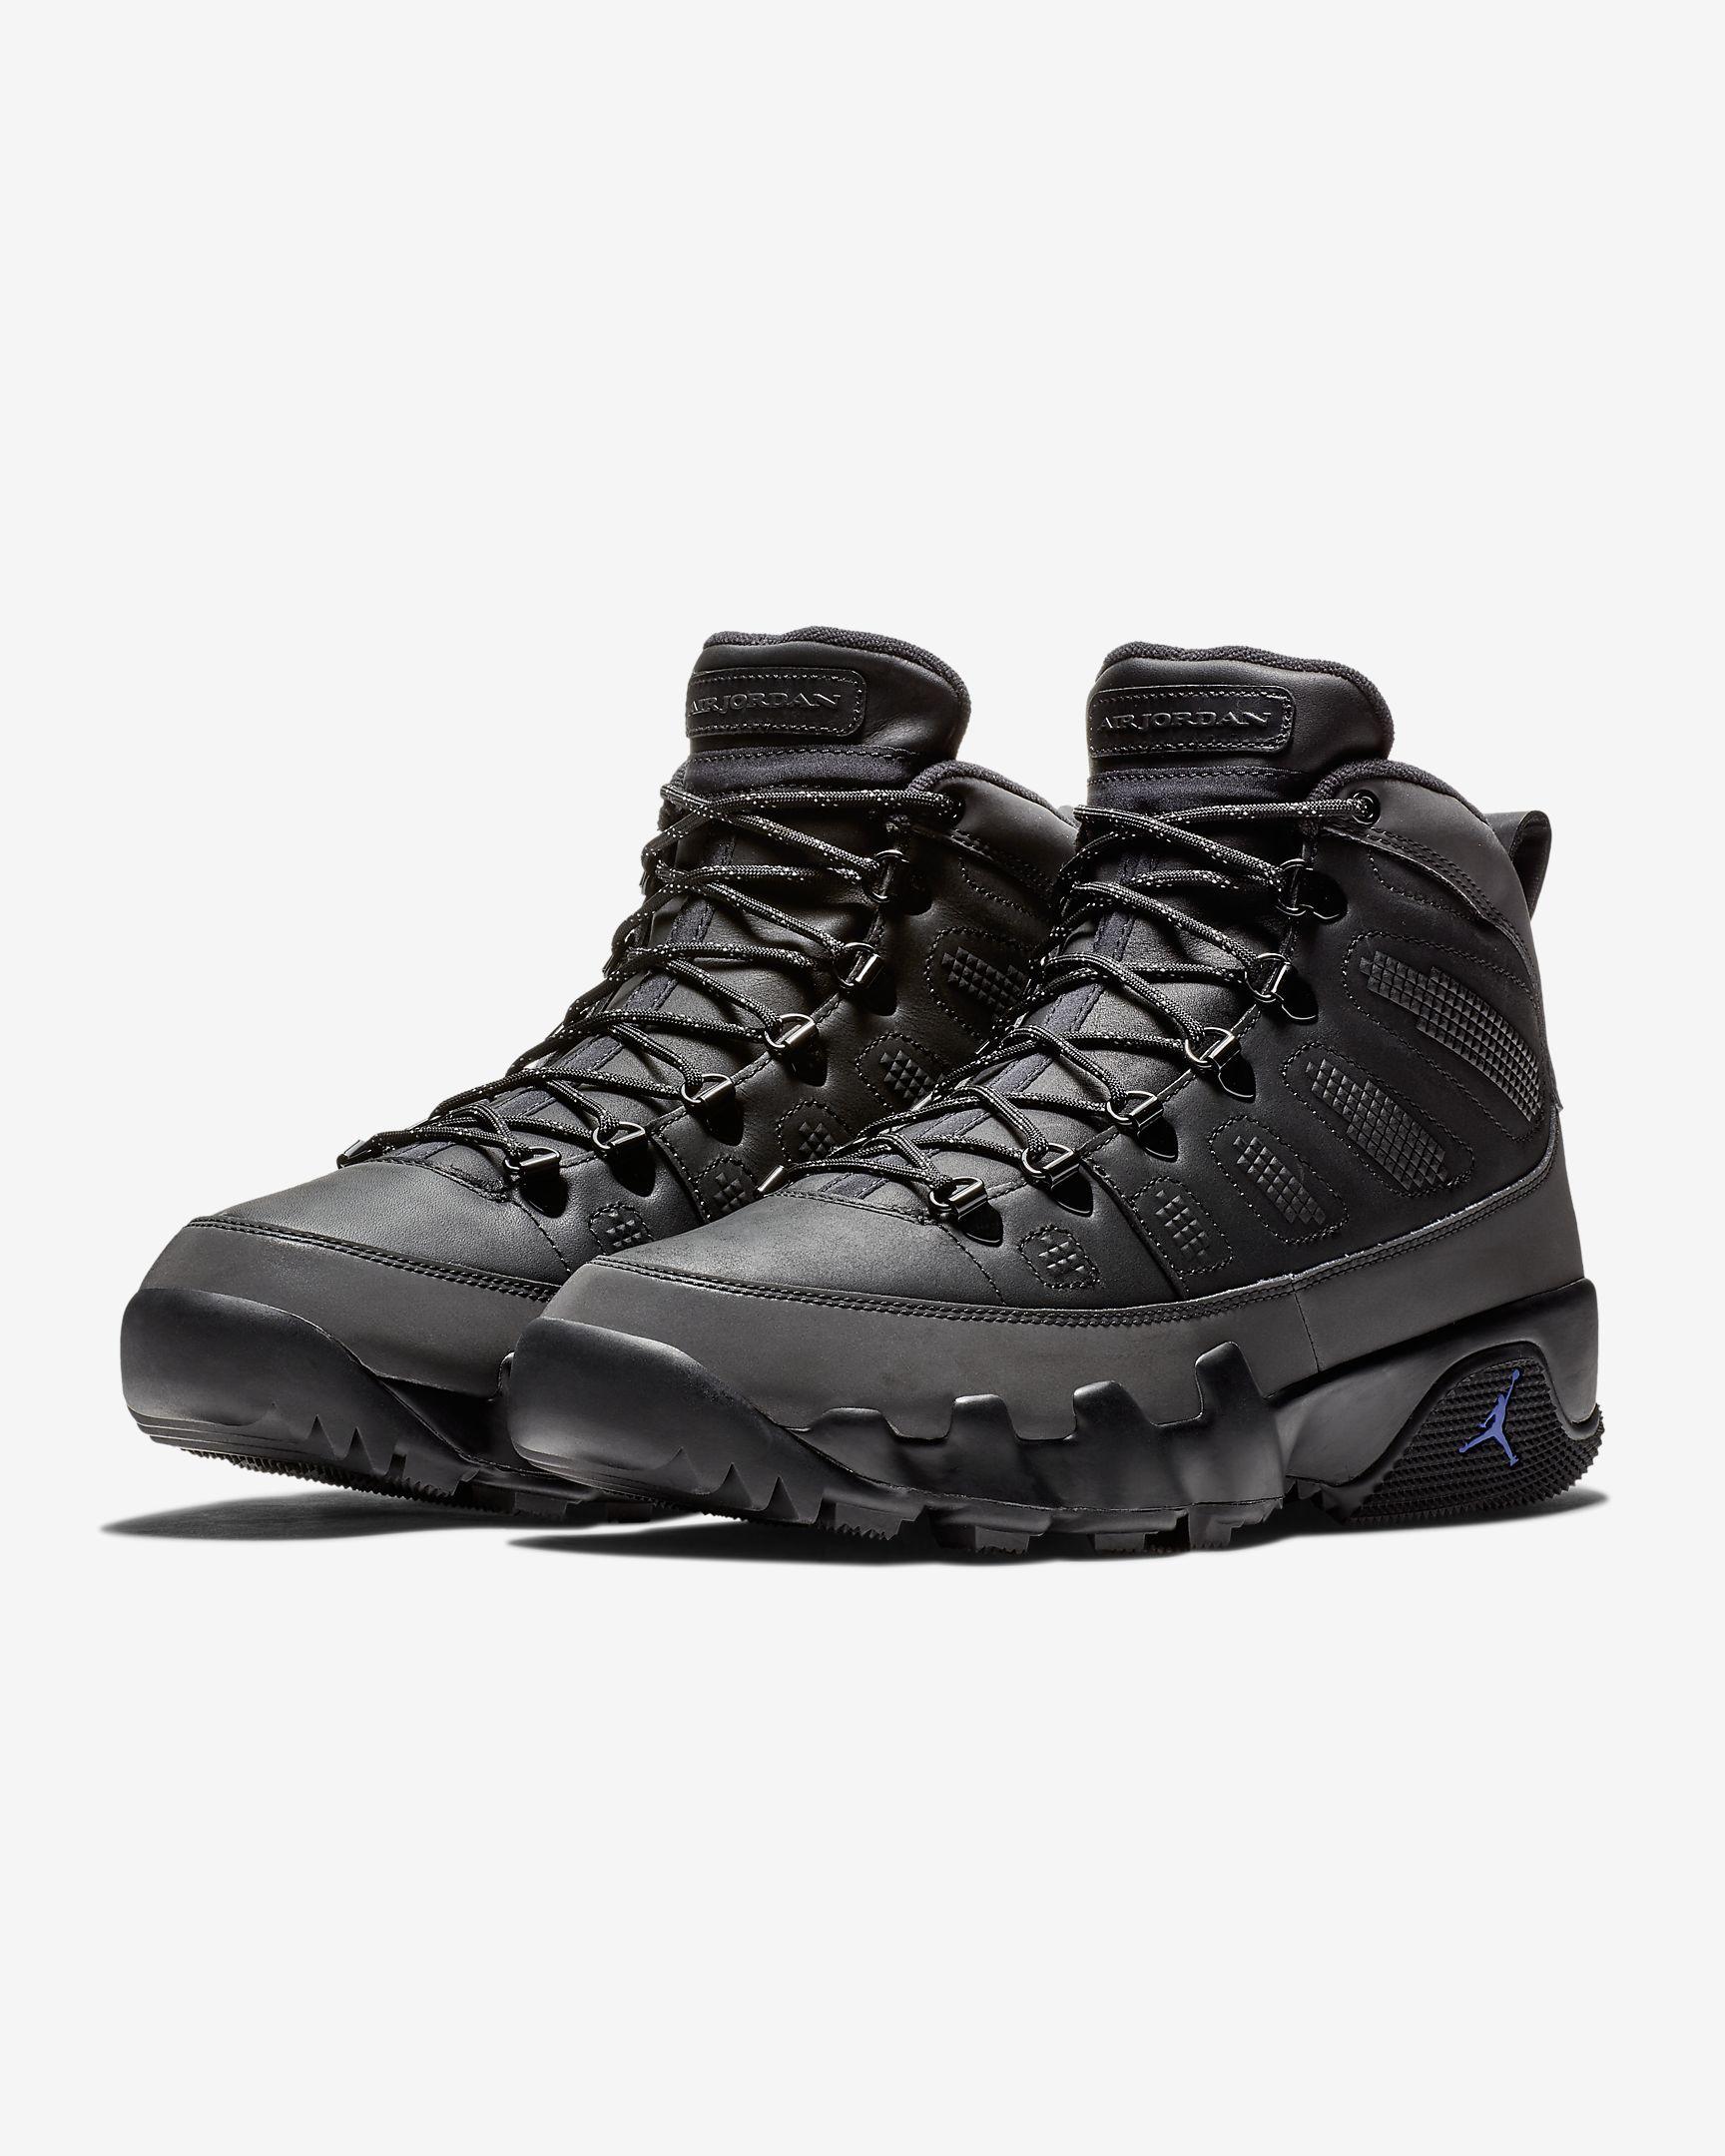 nike jordan boots